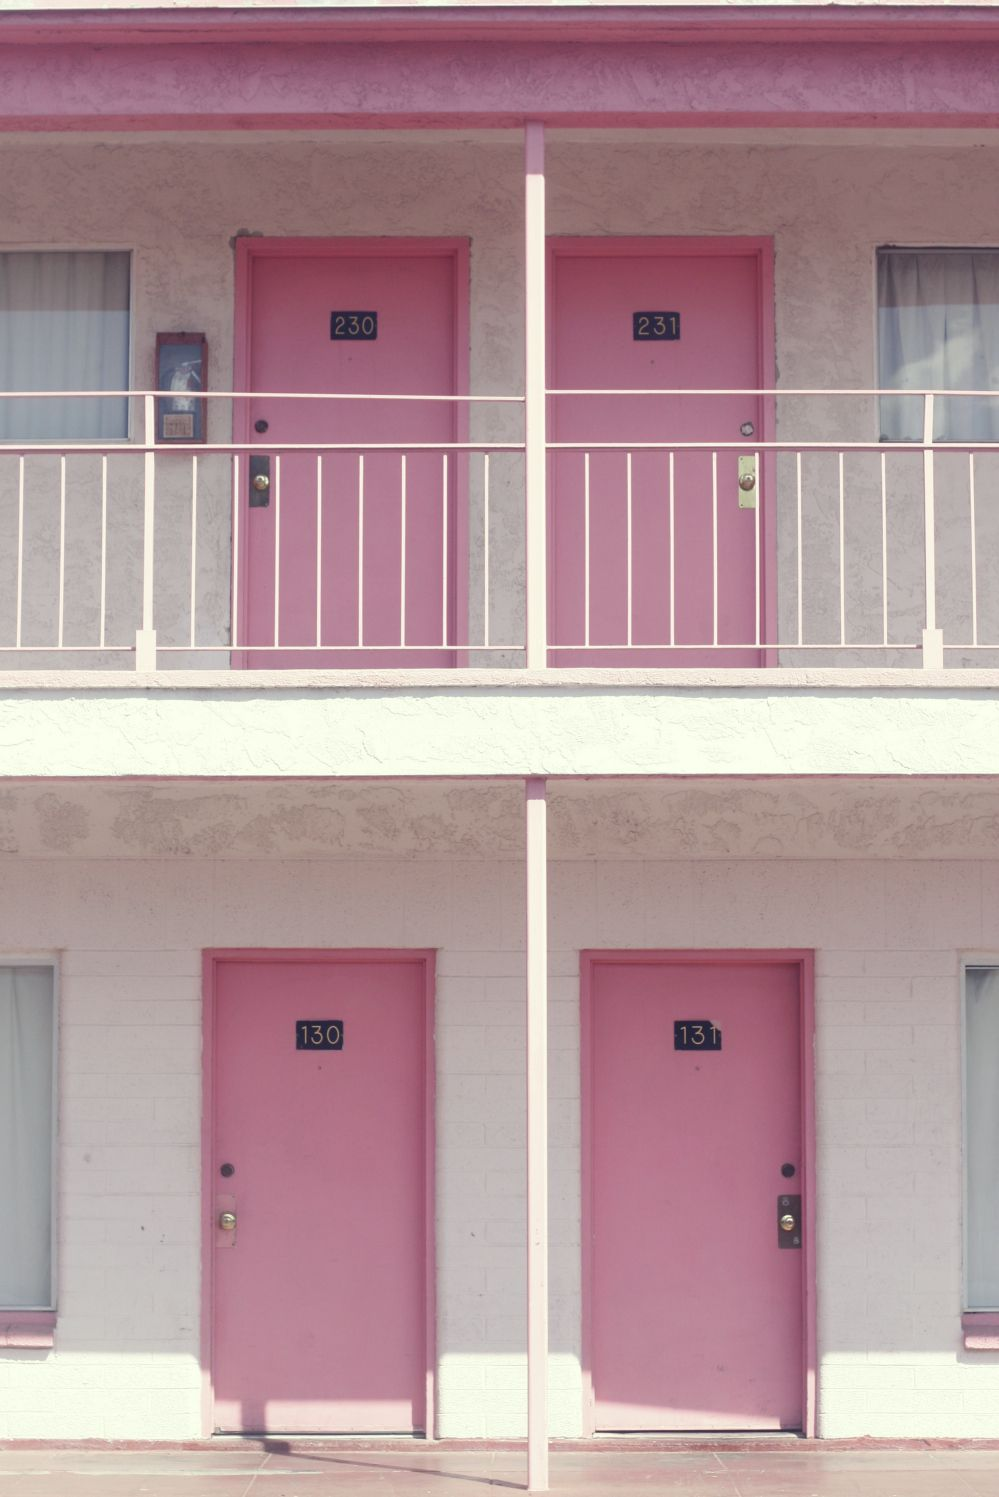 Pink motel doors in Las Vegas & Pink motel doors in Las Vegas   ART u0026 INSPIRATION   Pinterest ... pezcame.com